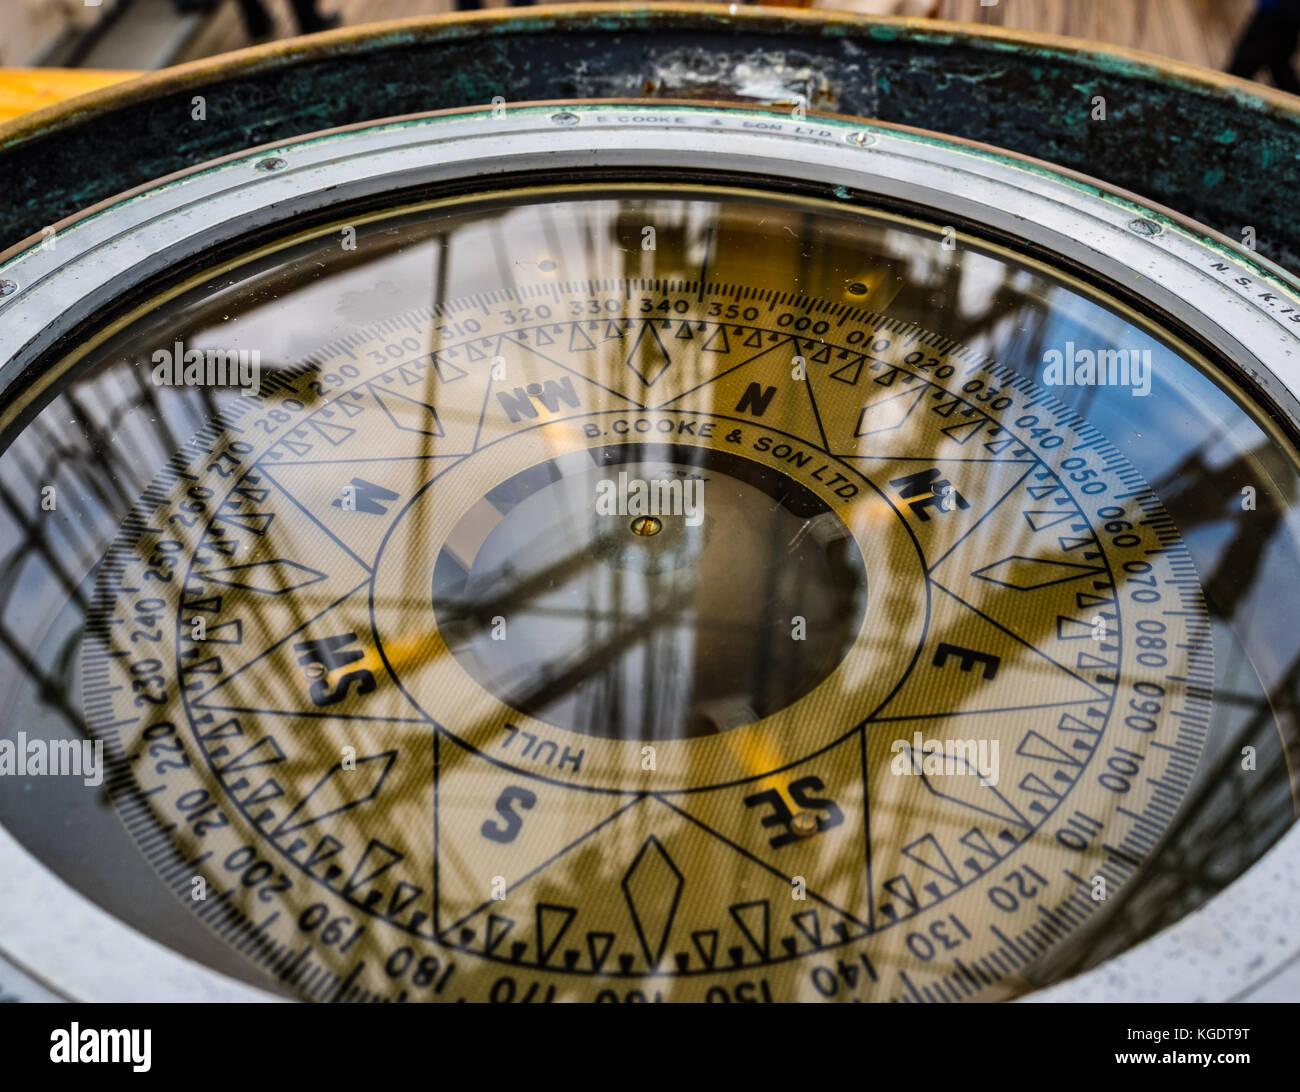 Compass from Tall Ship 'Kaskelot'. Southampton, England, UK. - Stock Image